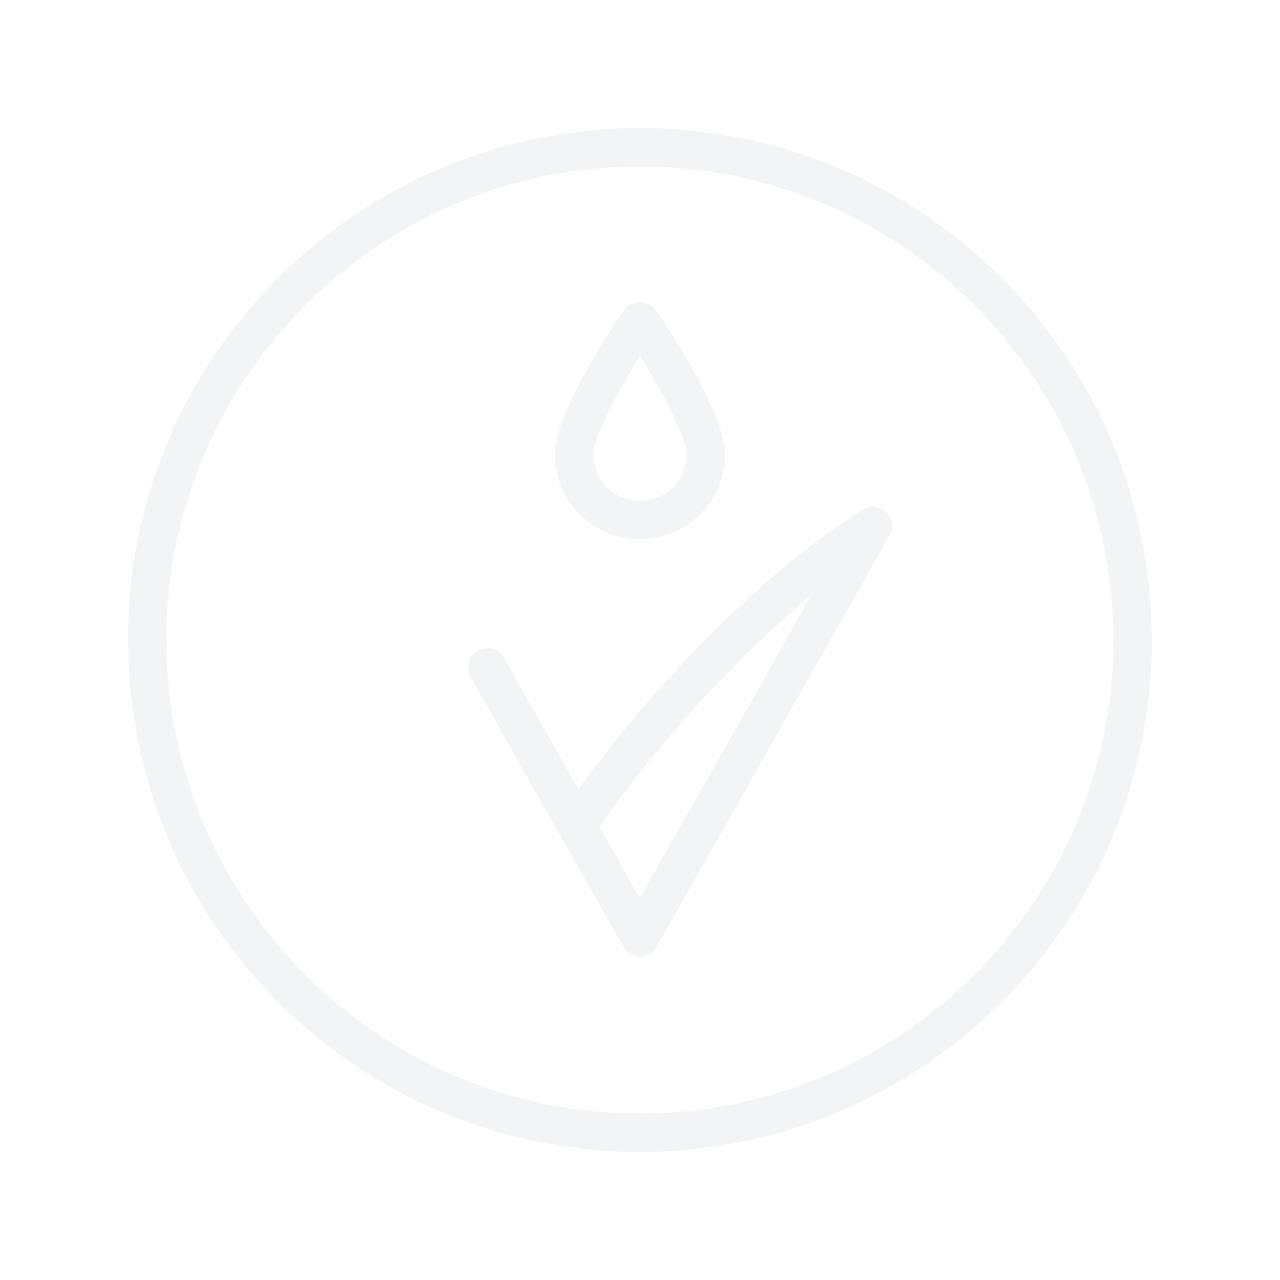 LIERAC Supra Radiance Double Peeling Radiance Mask 75ml